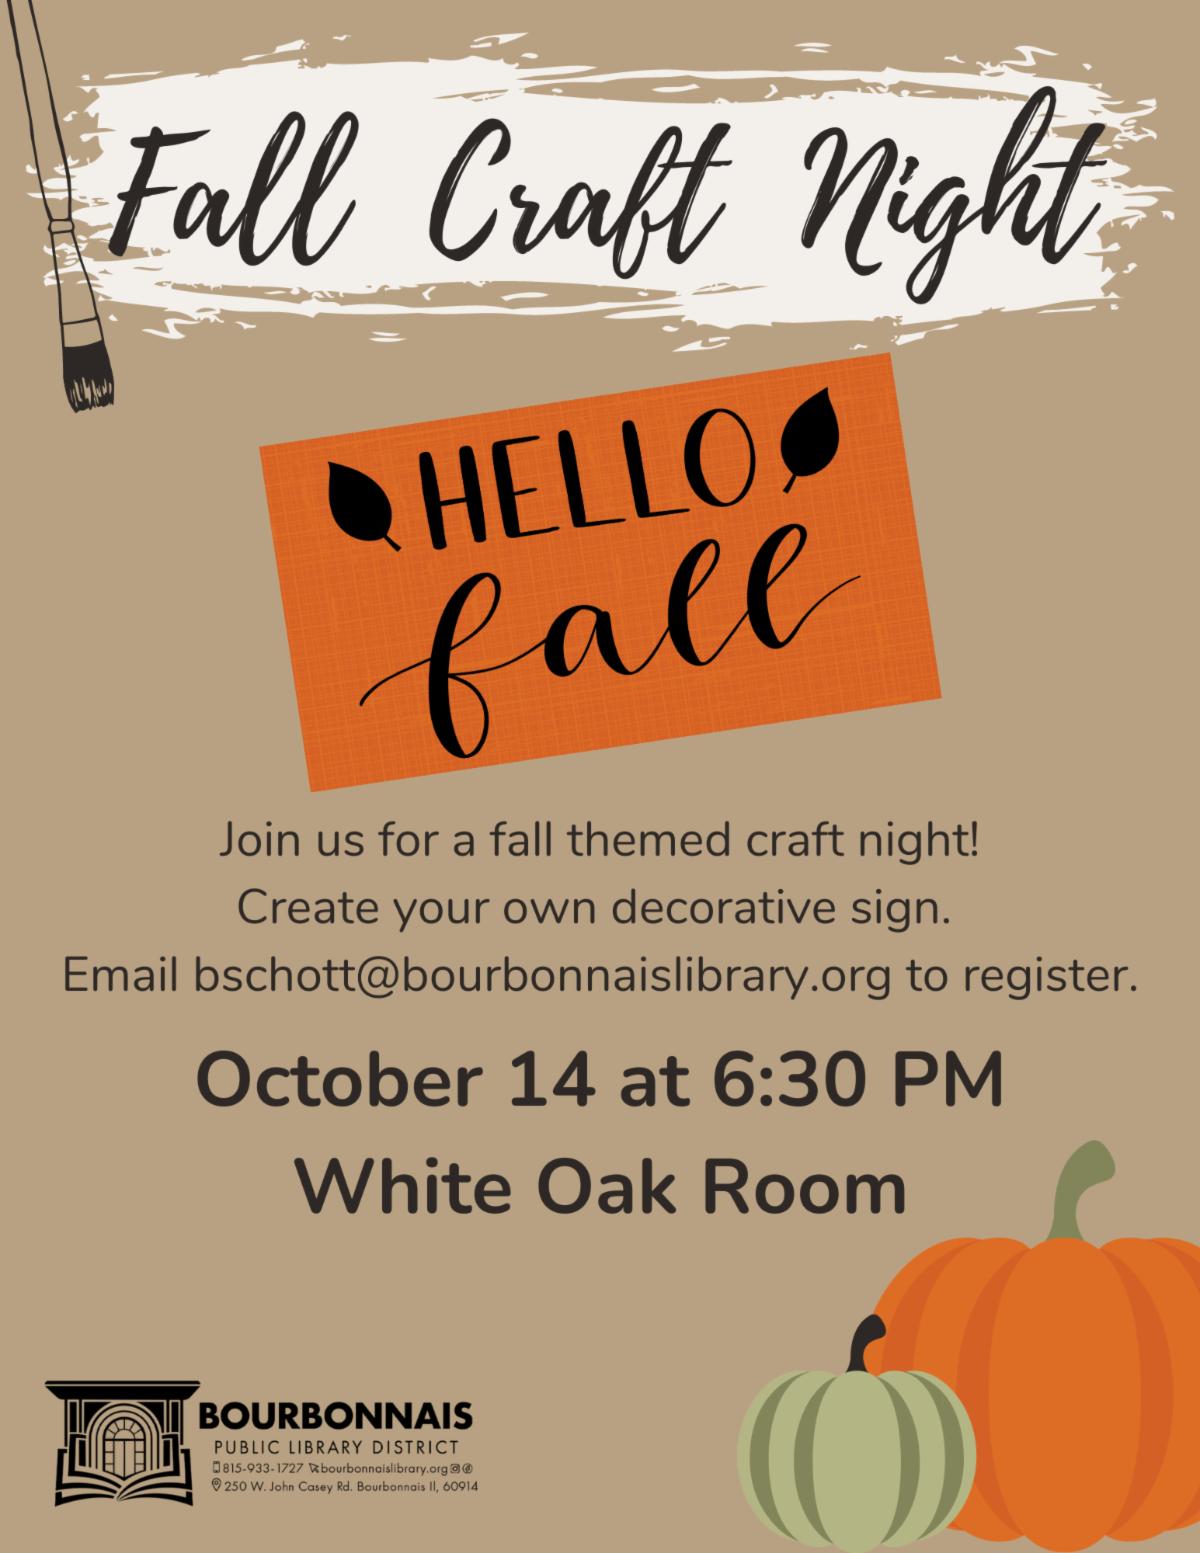 Fall Craft Night